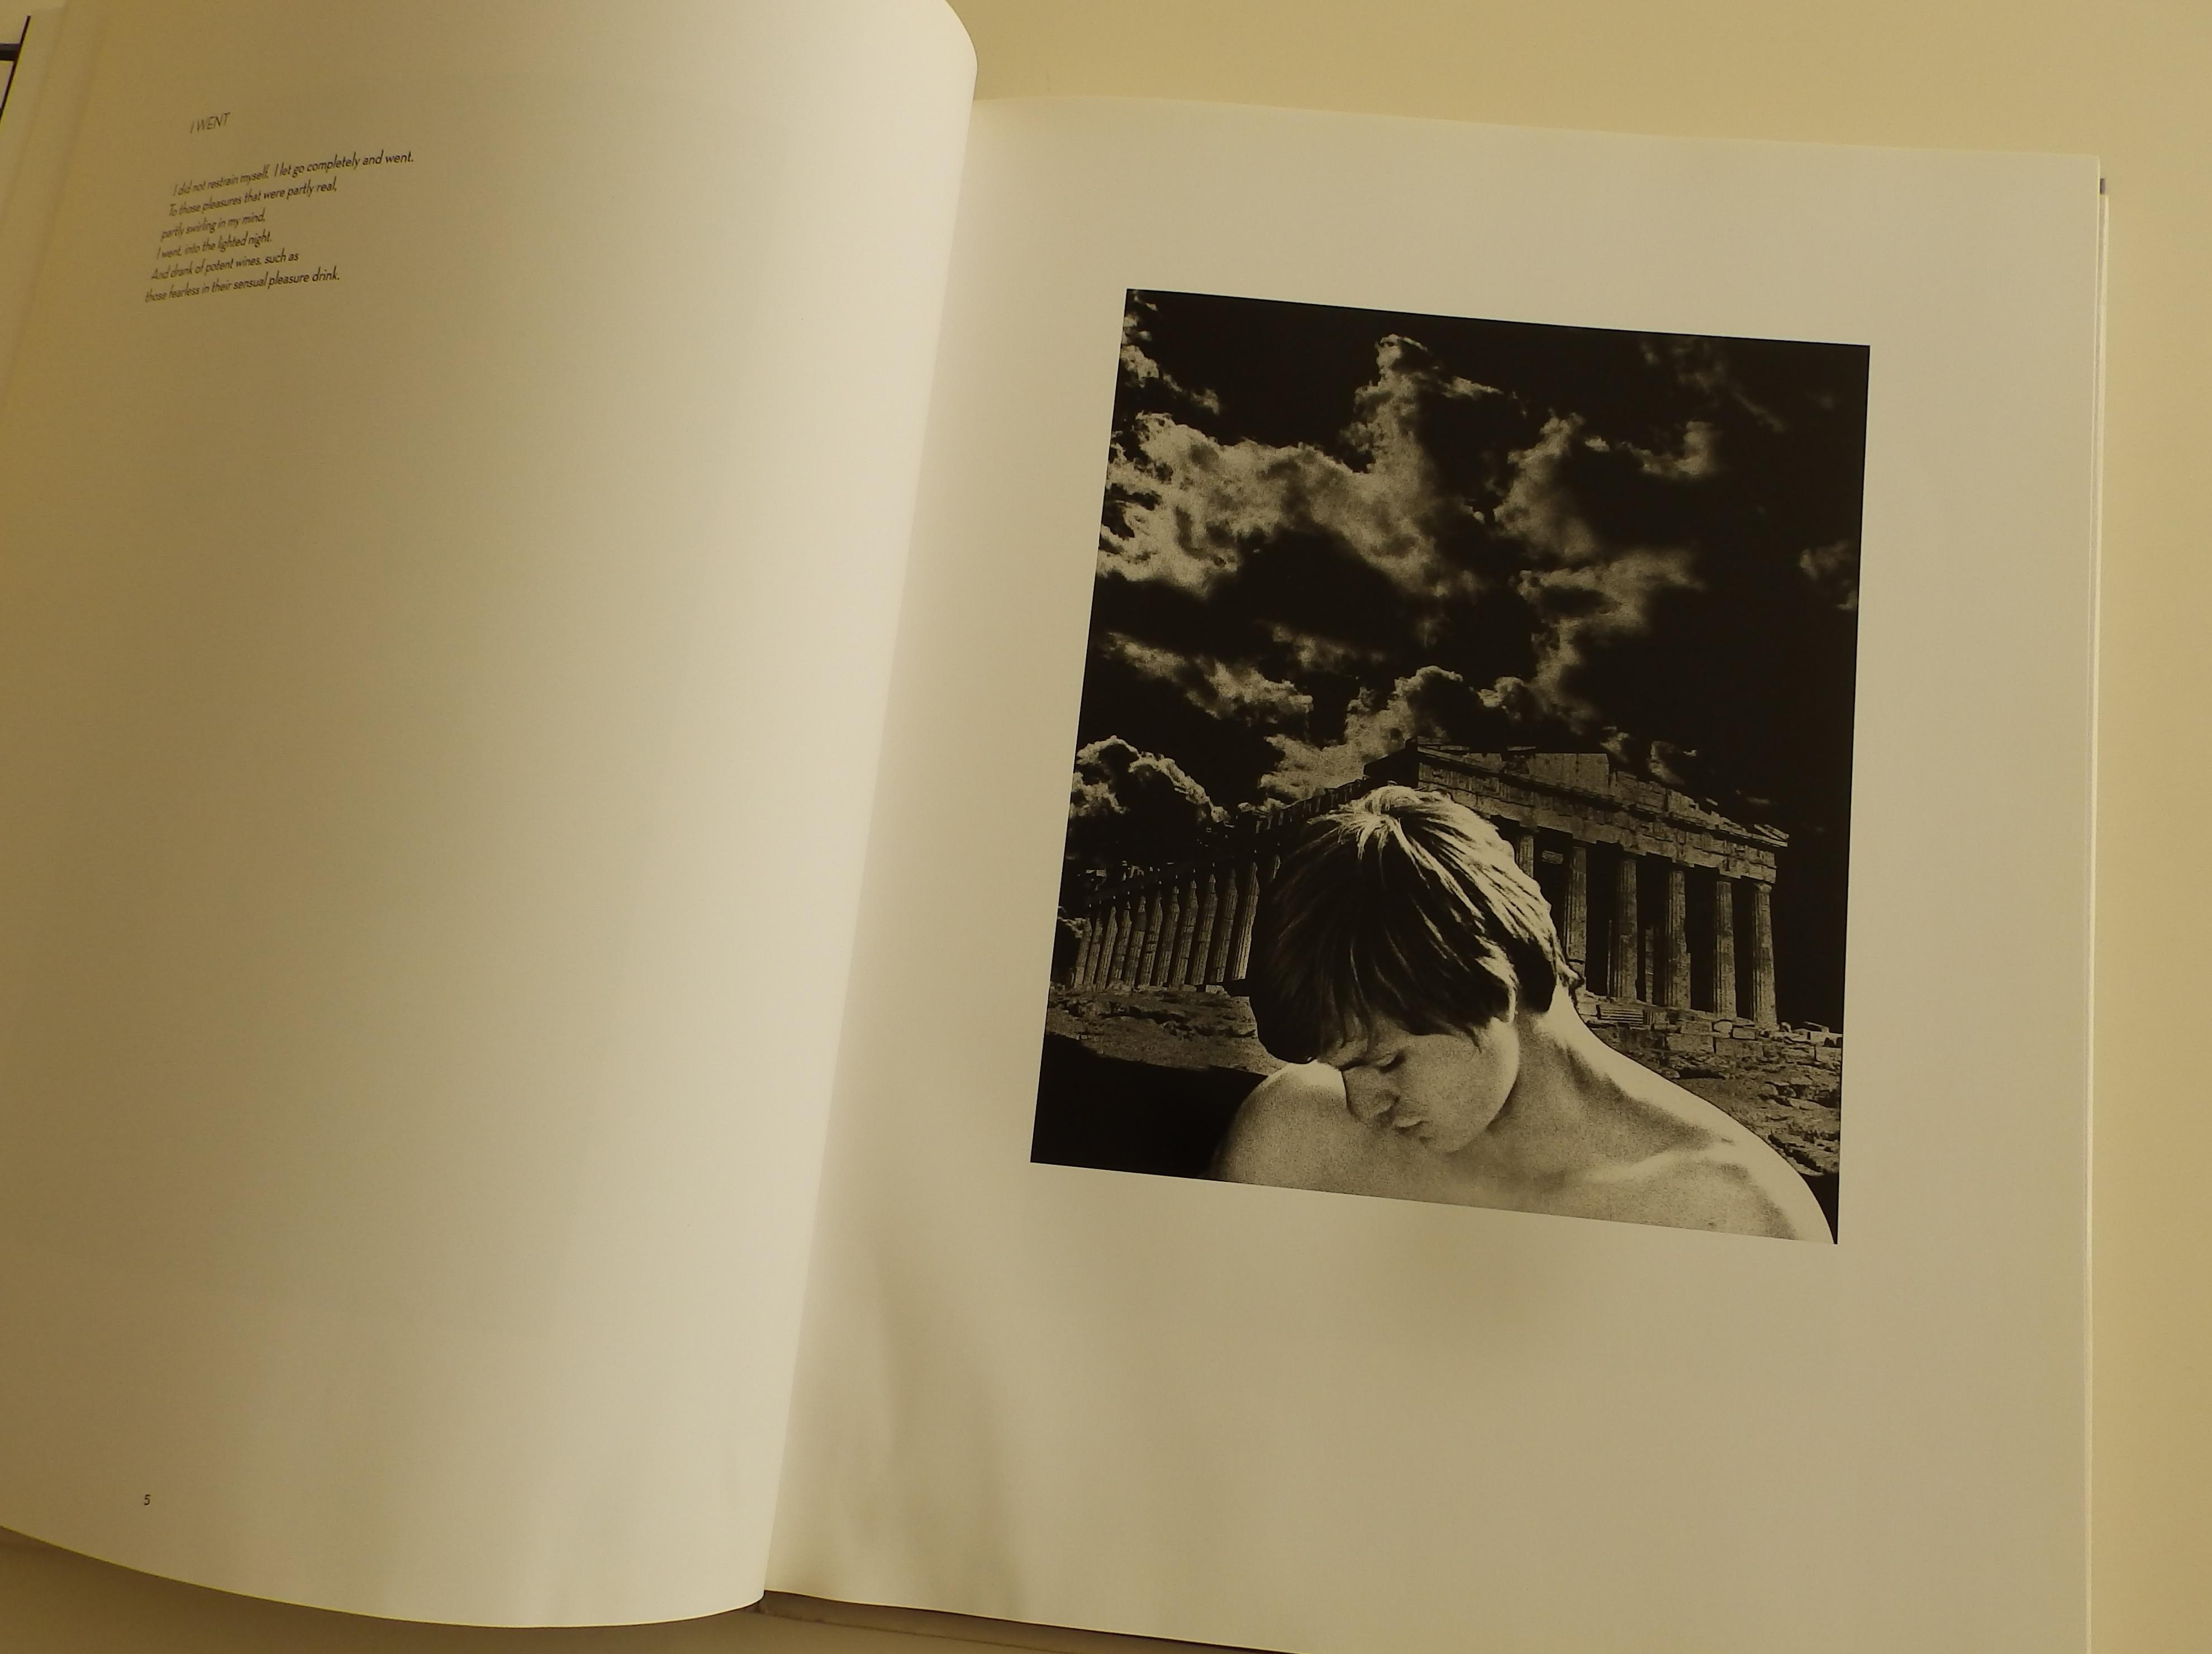 Stathis Orphanos, My Cavafy, book, Στάθης Ορφανός, Καβάφης, nikosonline.gr